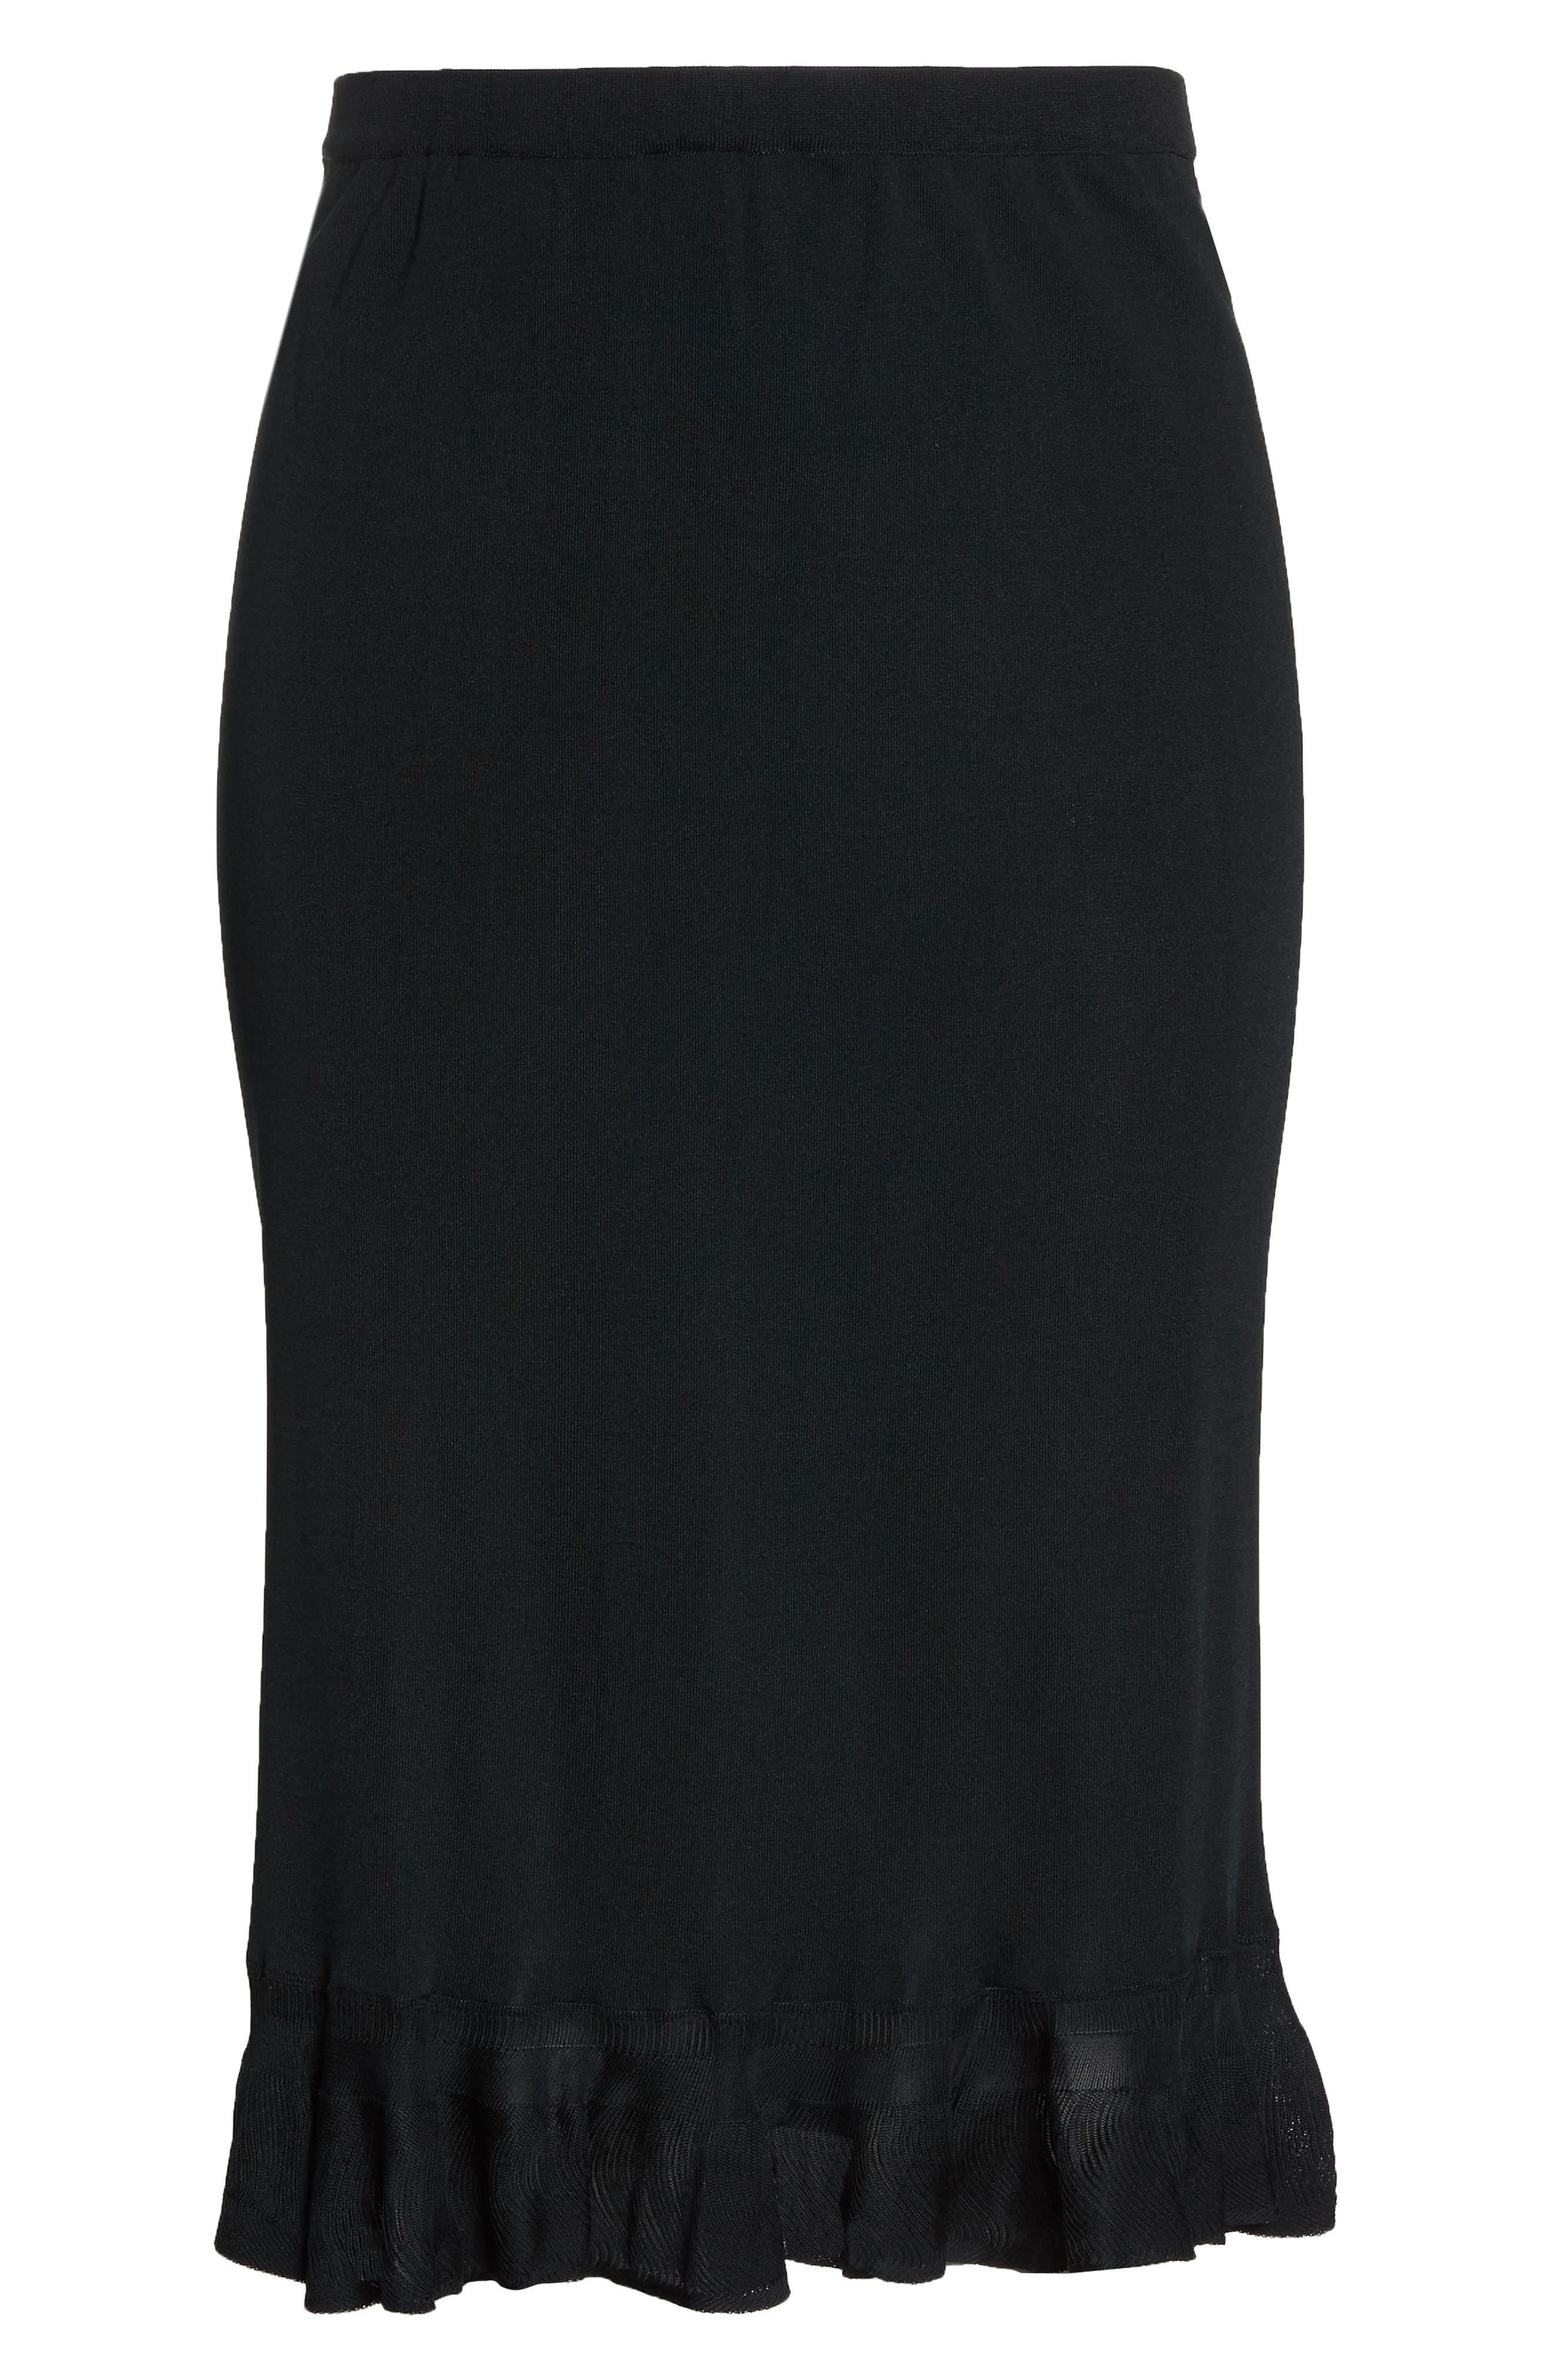 MING WANG,                             Ruffle Hem Skirt,                             Alternate thumbnail 6, color,                             BLACK